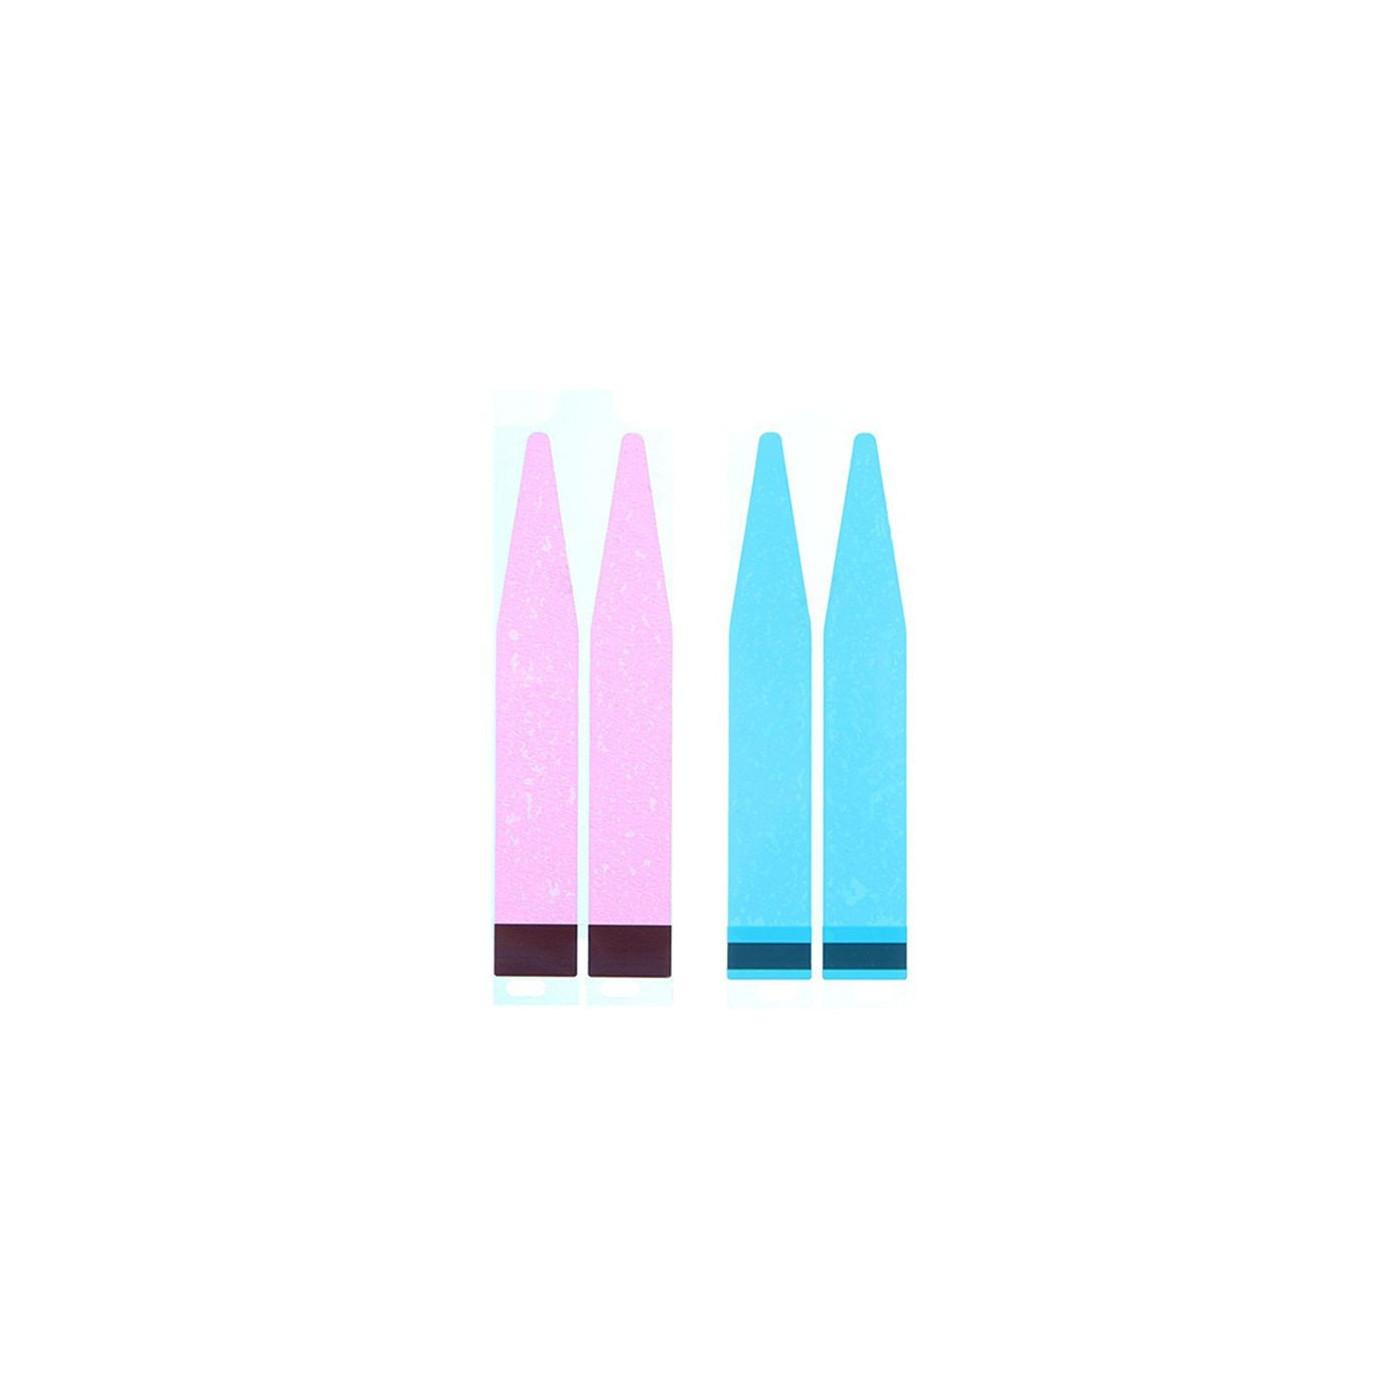 KLEBER BIADESIVE BATTERIE IPHONE 6 Batterie-Aufkleber ERSATZ ERSETZEN